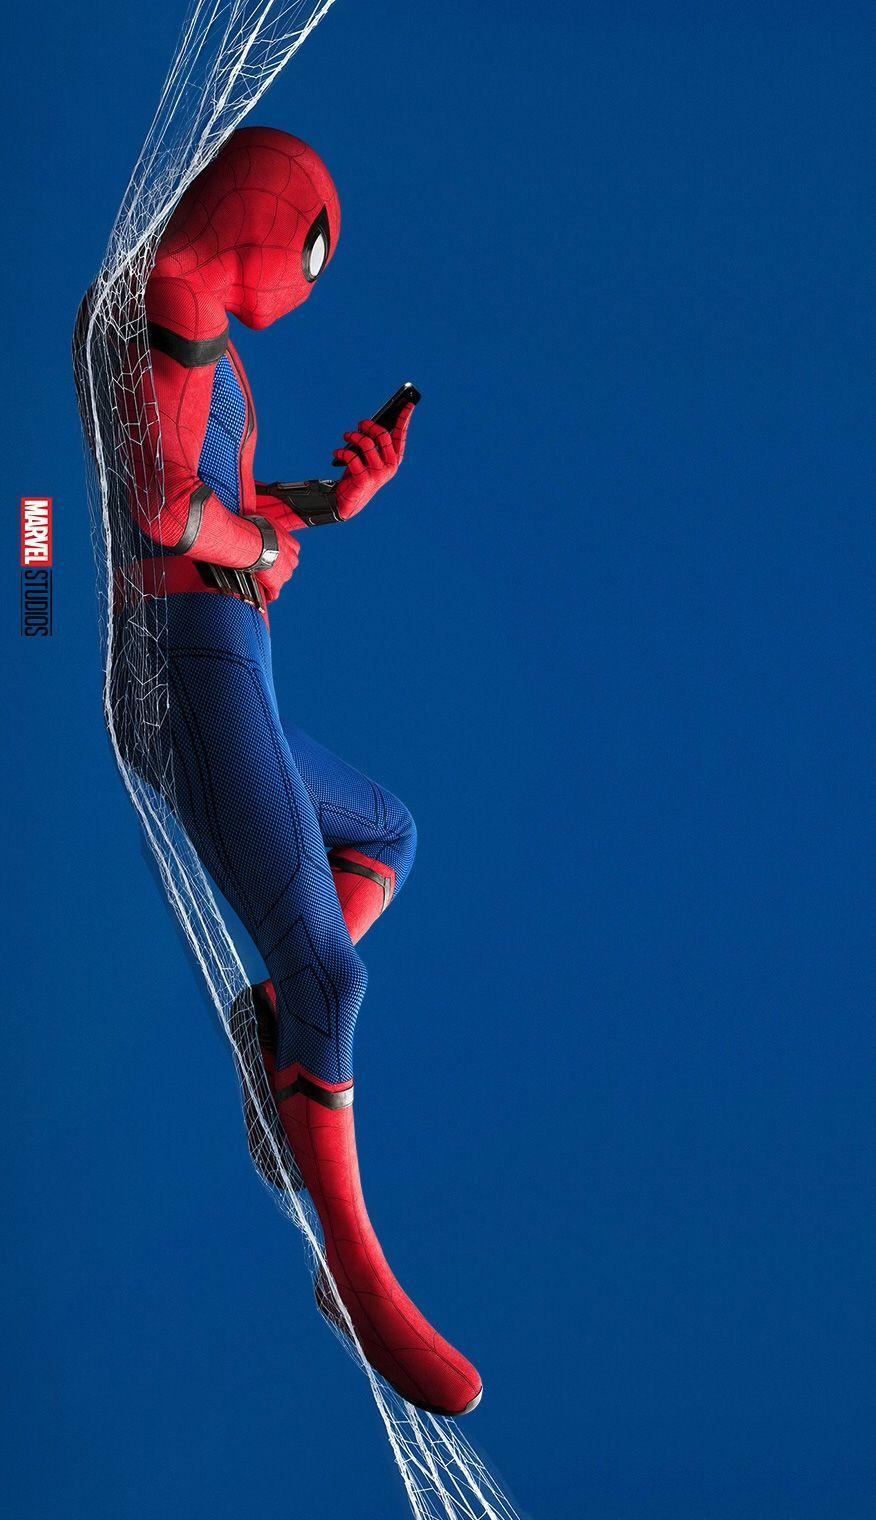 Spider Man Spider Man Homecoming Avengers Infinity War Avengers Endgame Marvel Mcu Spiderman Ave Avengers Personnages Heros Marvel Fond D Ecran Avengers